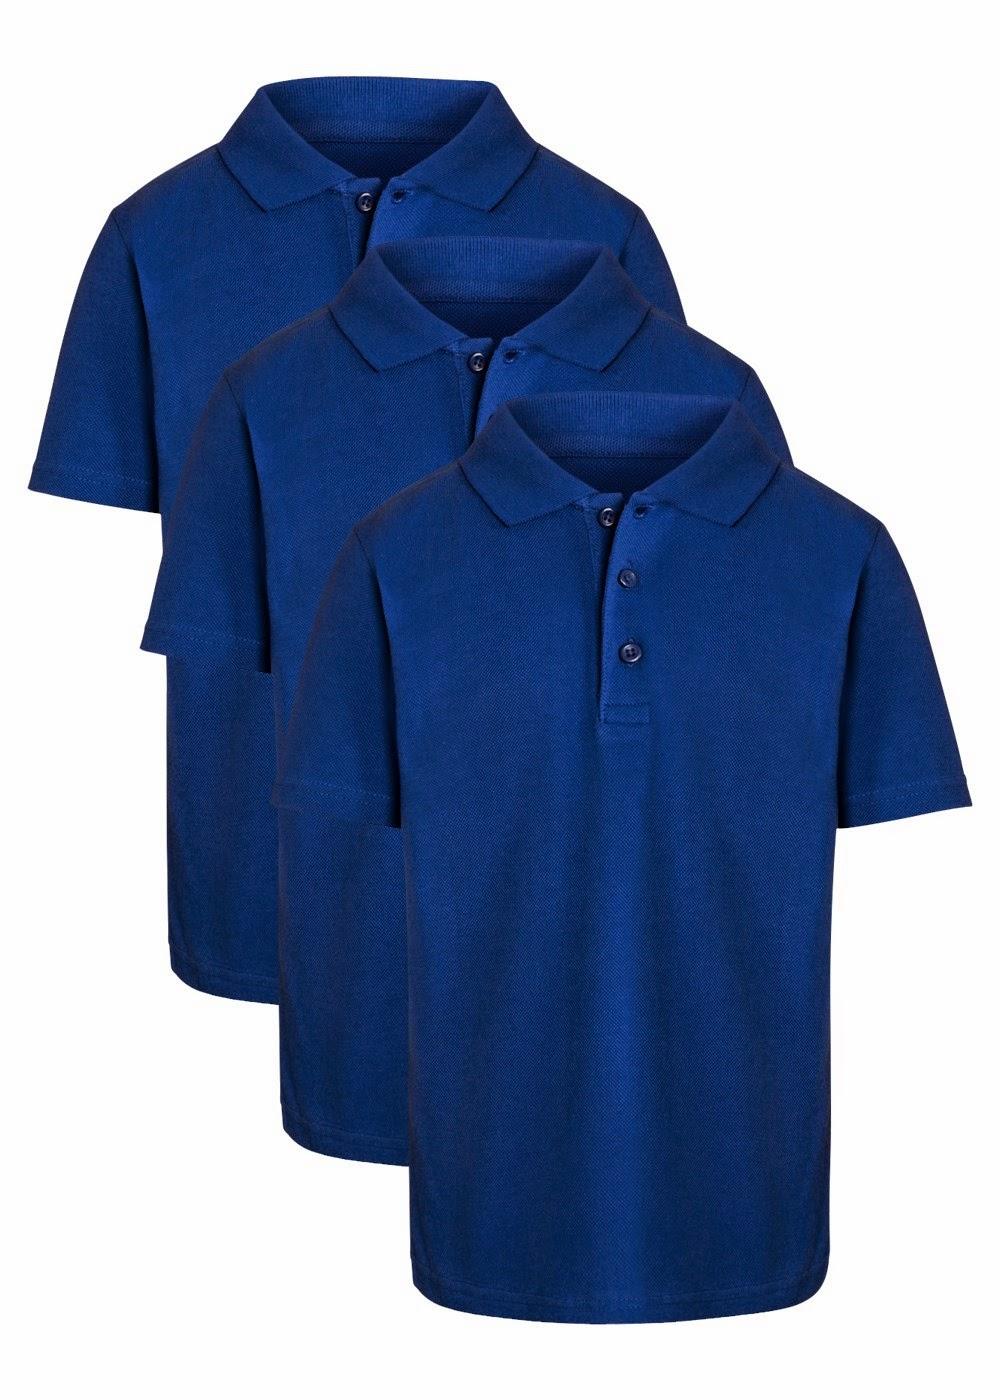 George   Girls Short Sleeve Polo Shirts 4 Pack  2 Royal Blue  2